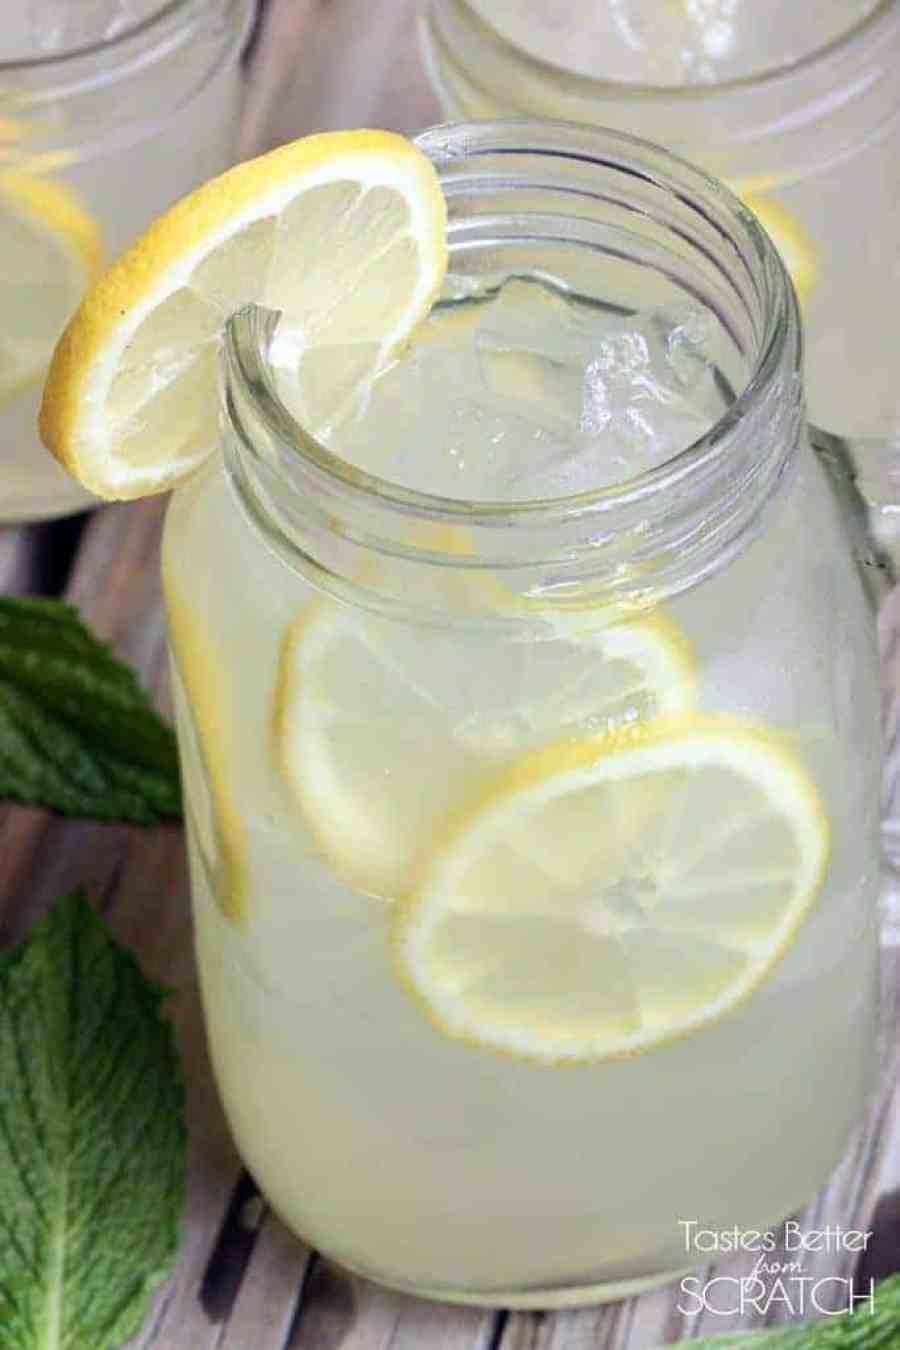 Fresh Squeezed Lemonade on TastesBetterFromScratch.com